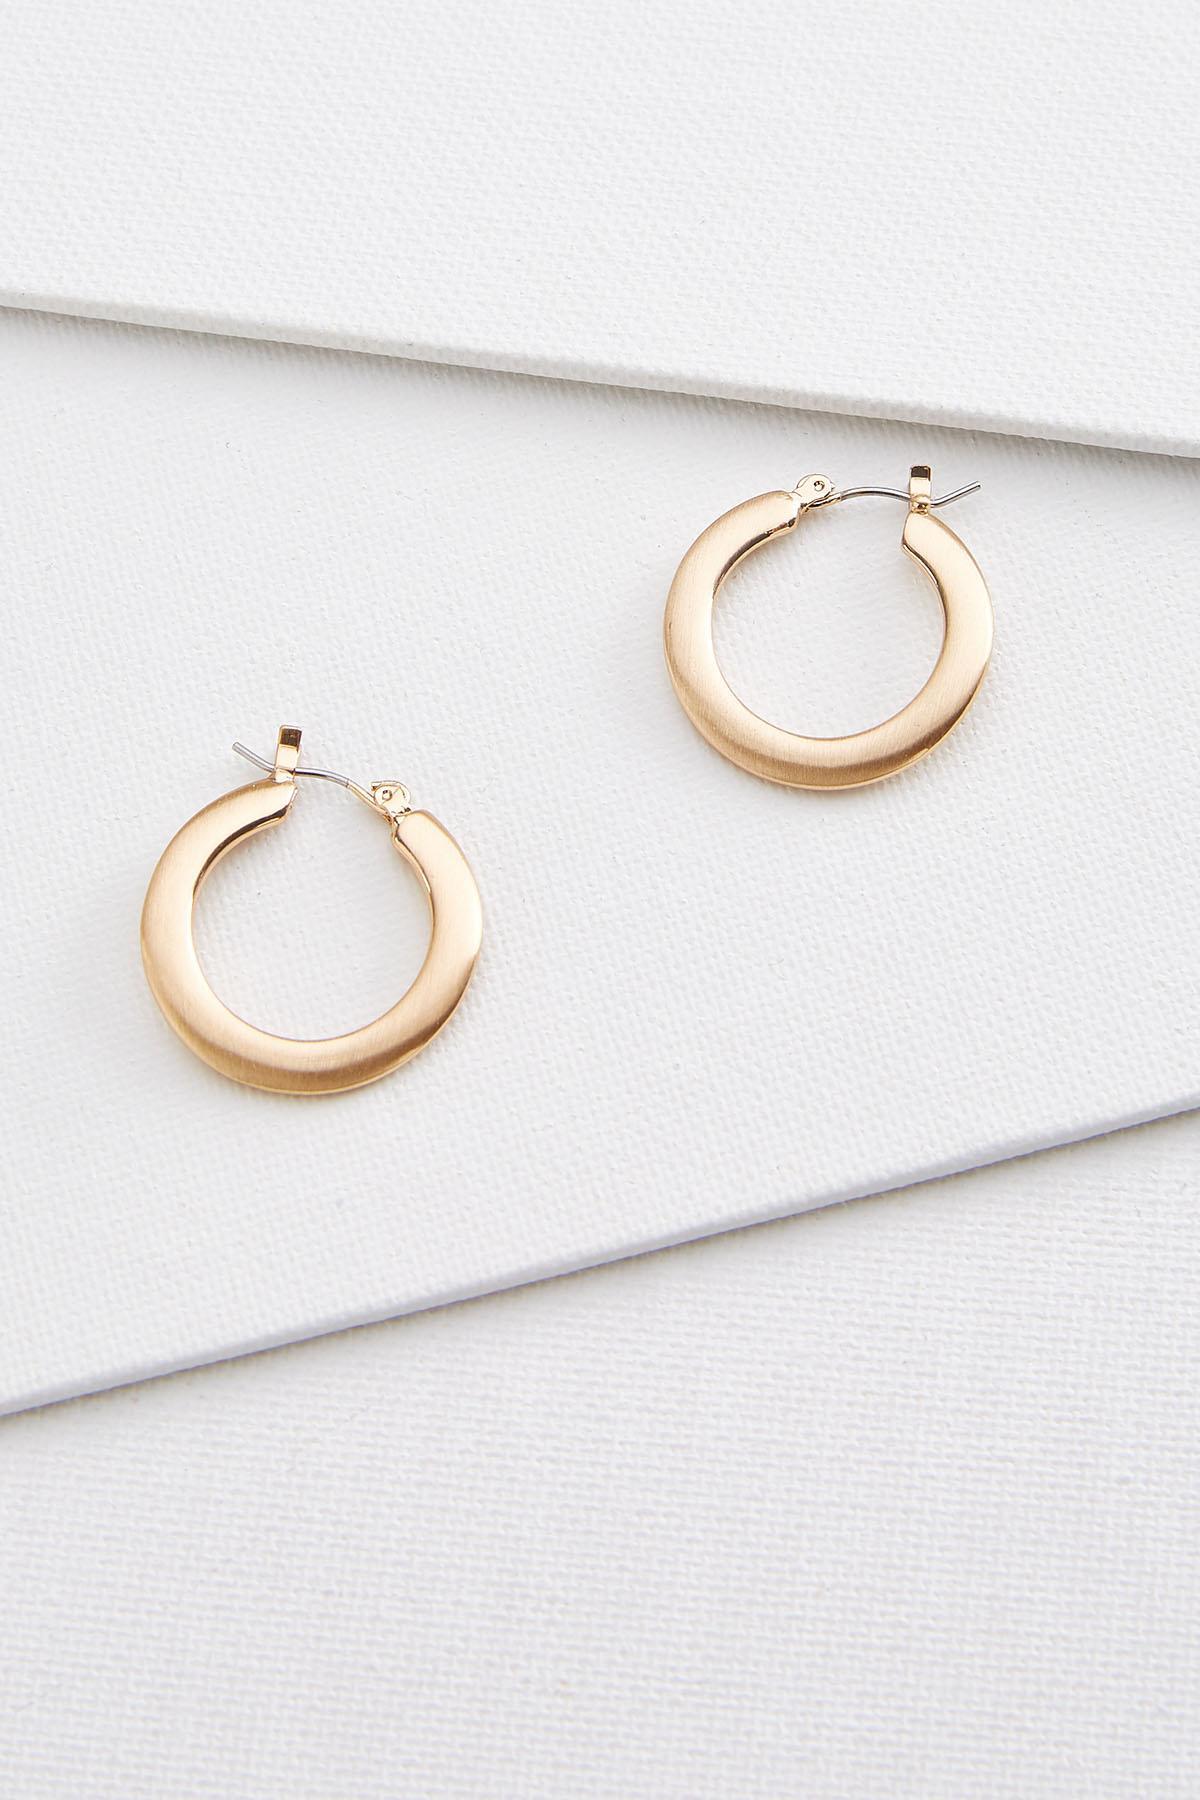 Mod Chunky Hoop Earrings